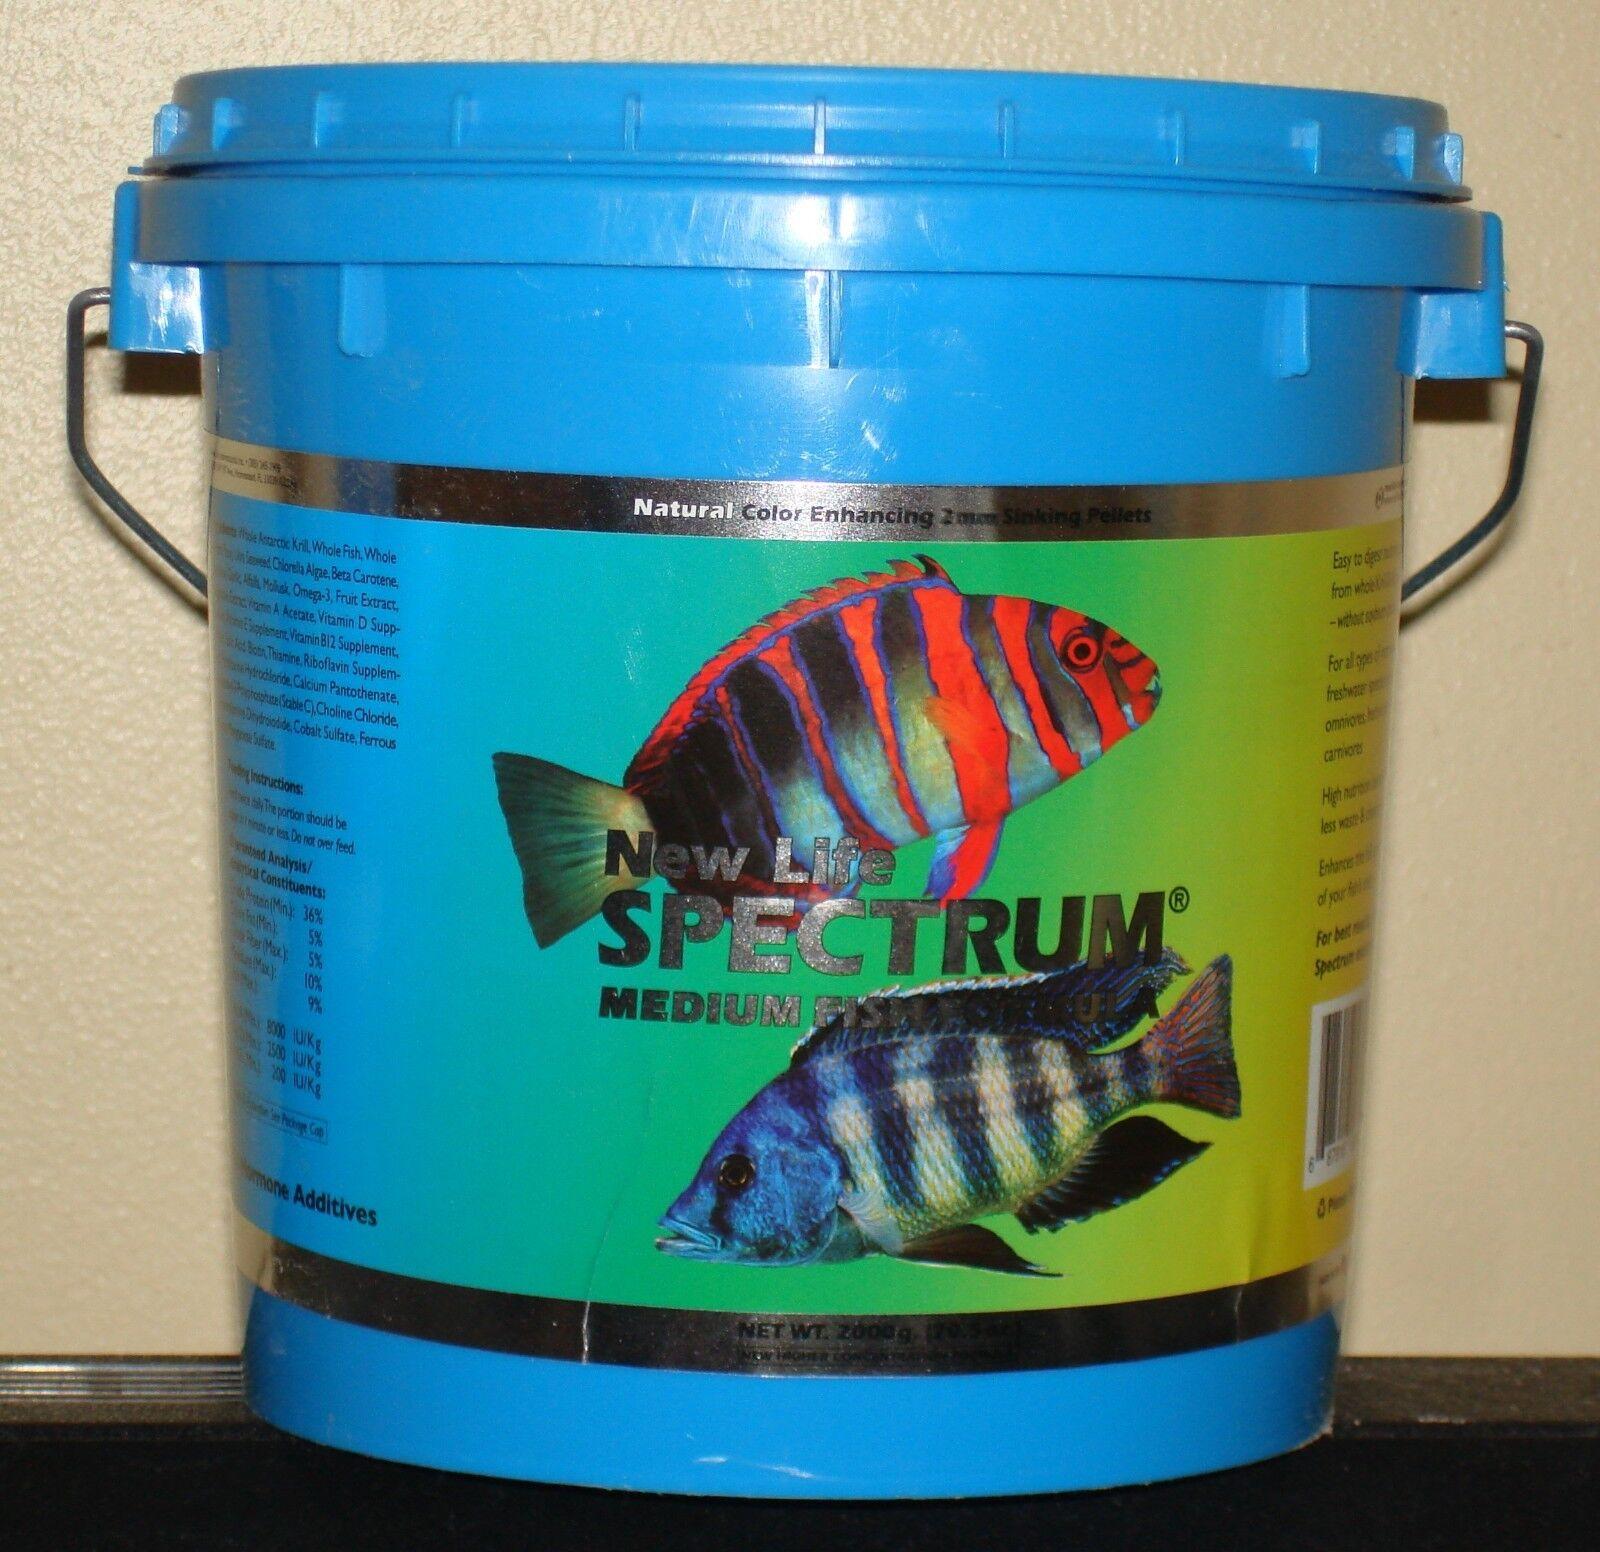 NEW LIFE SPECTRUM MEDIUM FISH FOOD  2000 gm  2 mm sinking pellets  NLS